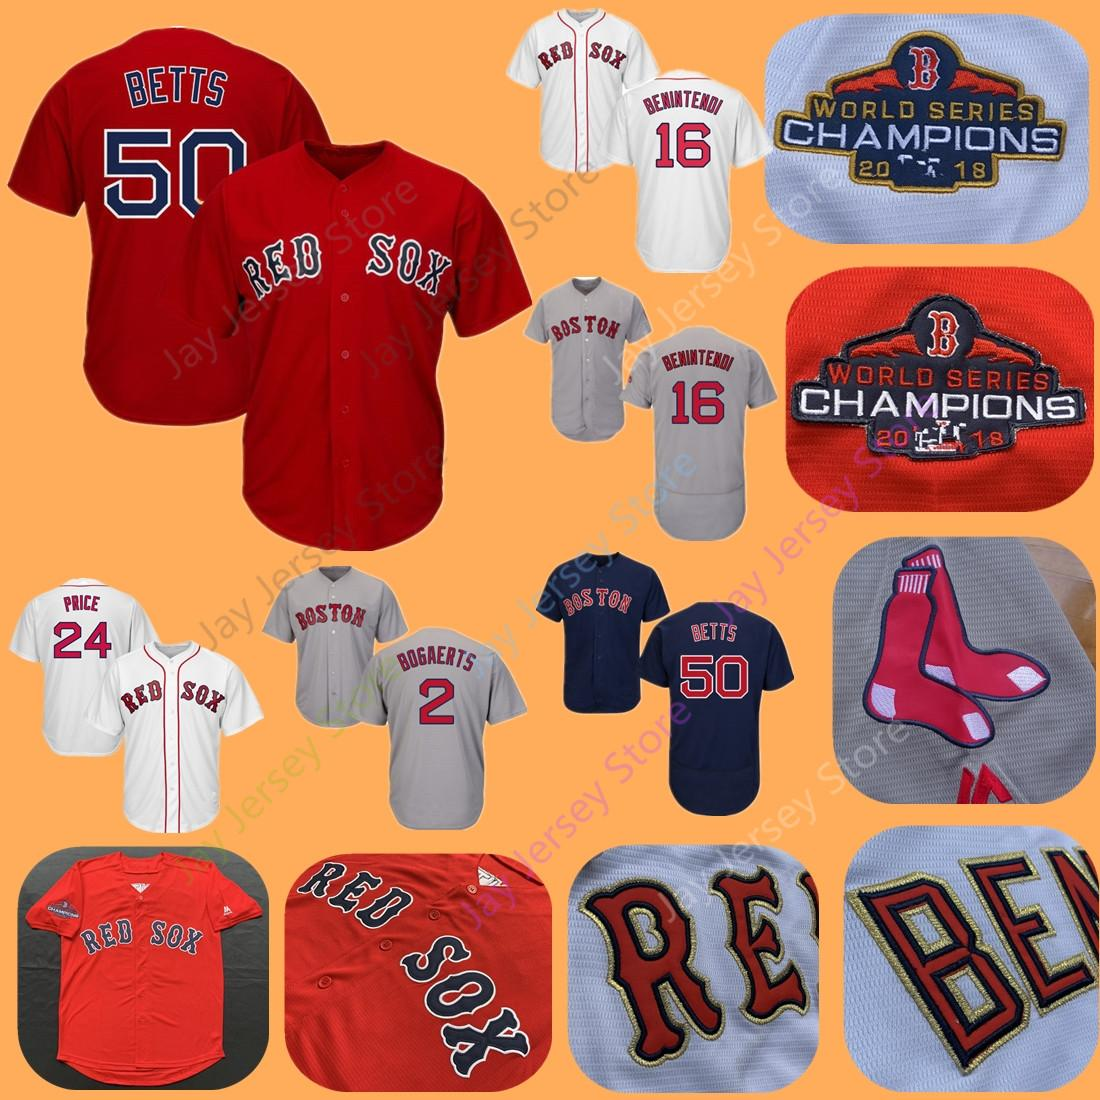 wholesale dealer db6bd 3dea2 Boston Betts Benintendi Jersey Red Sox 2018 WS World Series Gold Champions  Bogaerts Pedroia Bradley Sale Martinez Ortiz Price Martinez Women